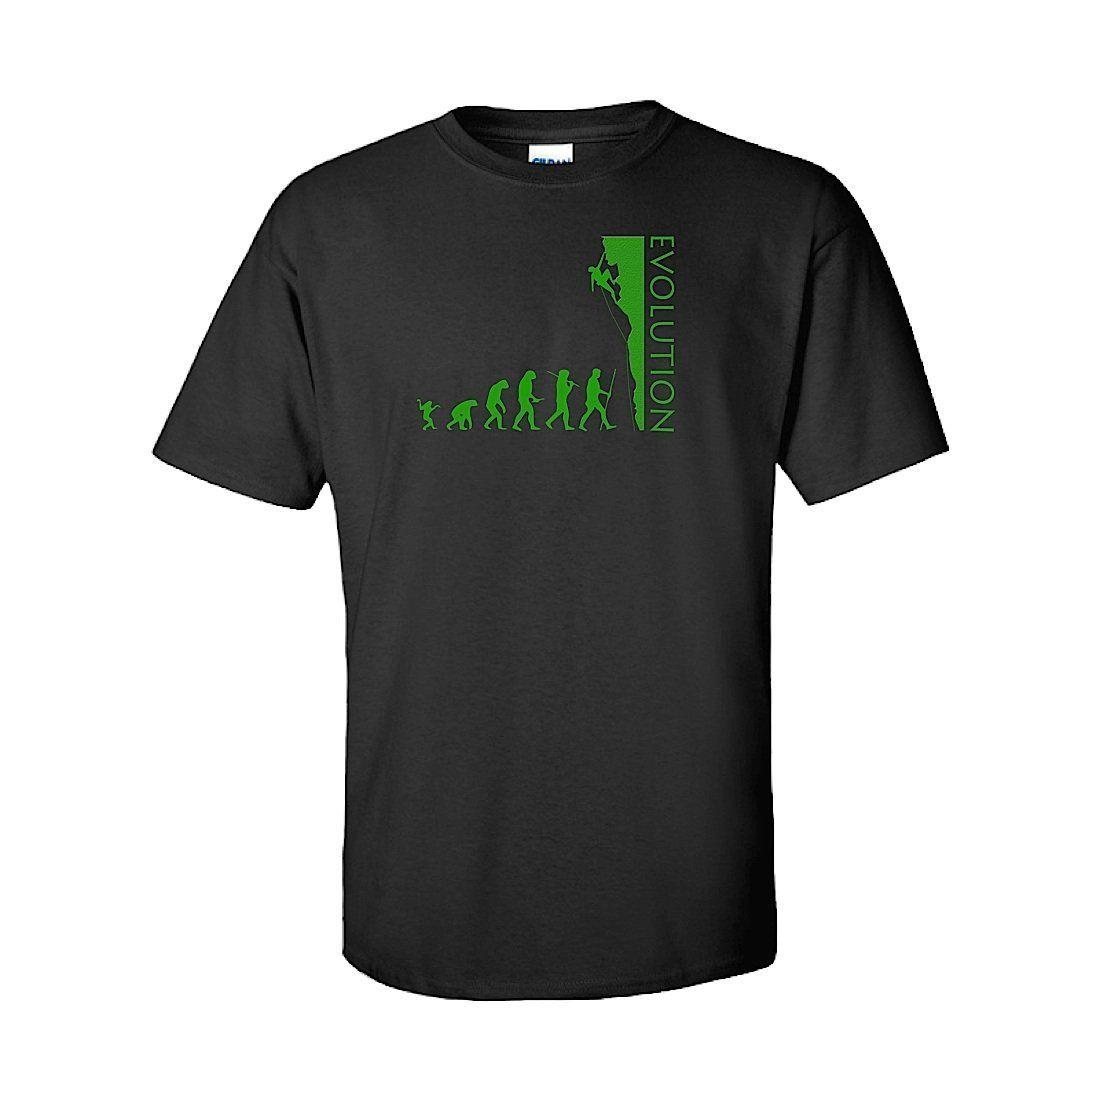 IamTee Climbing Evolution T-Shirt